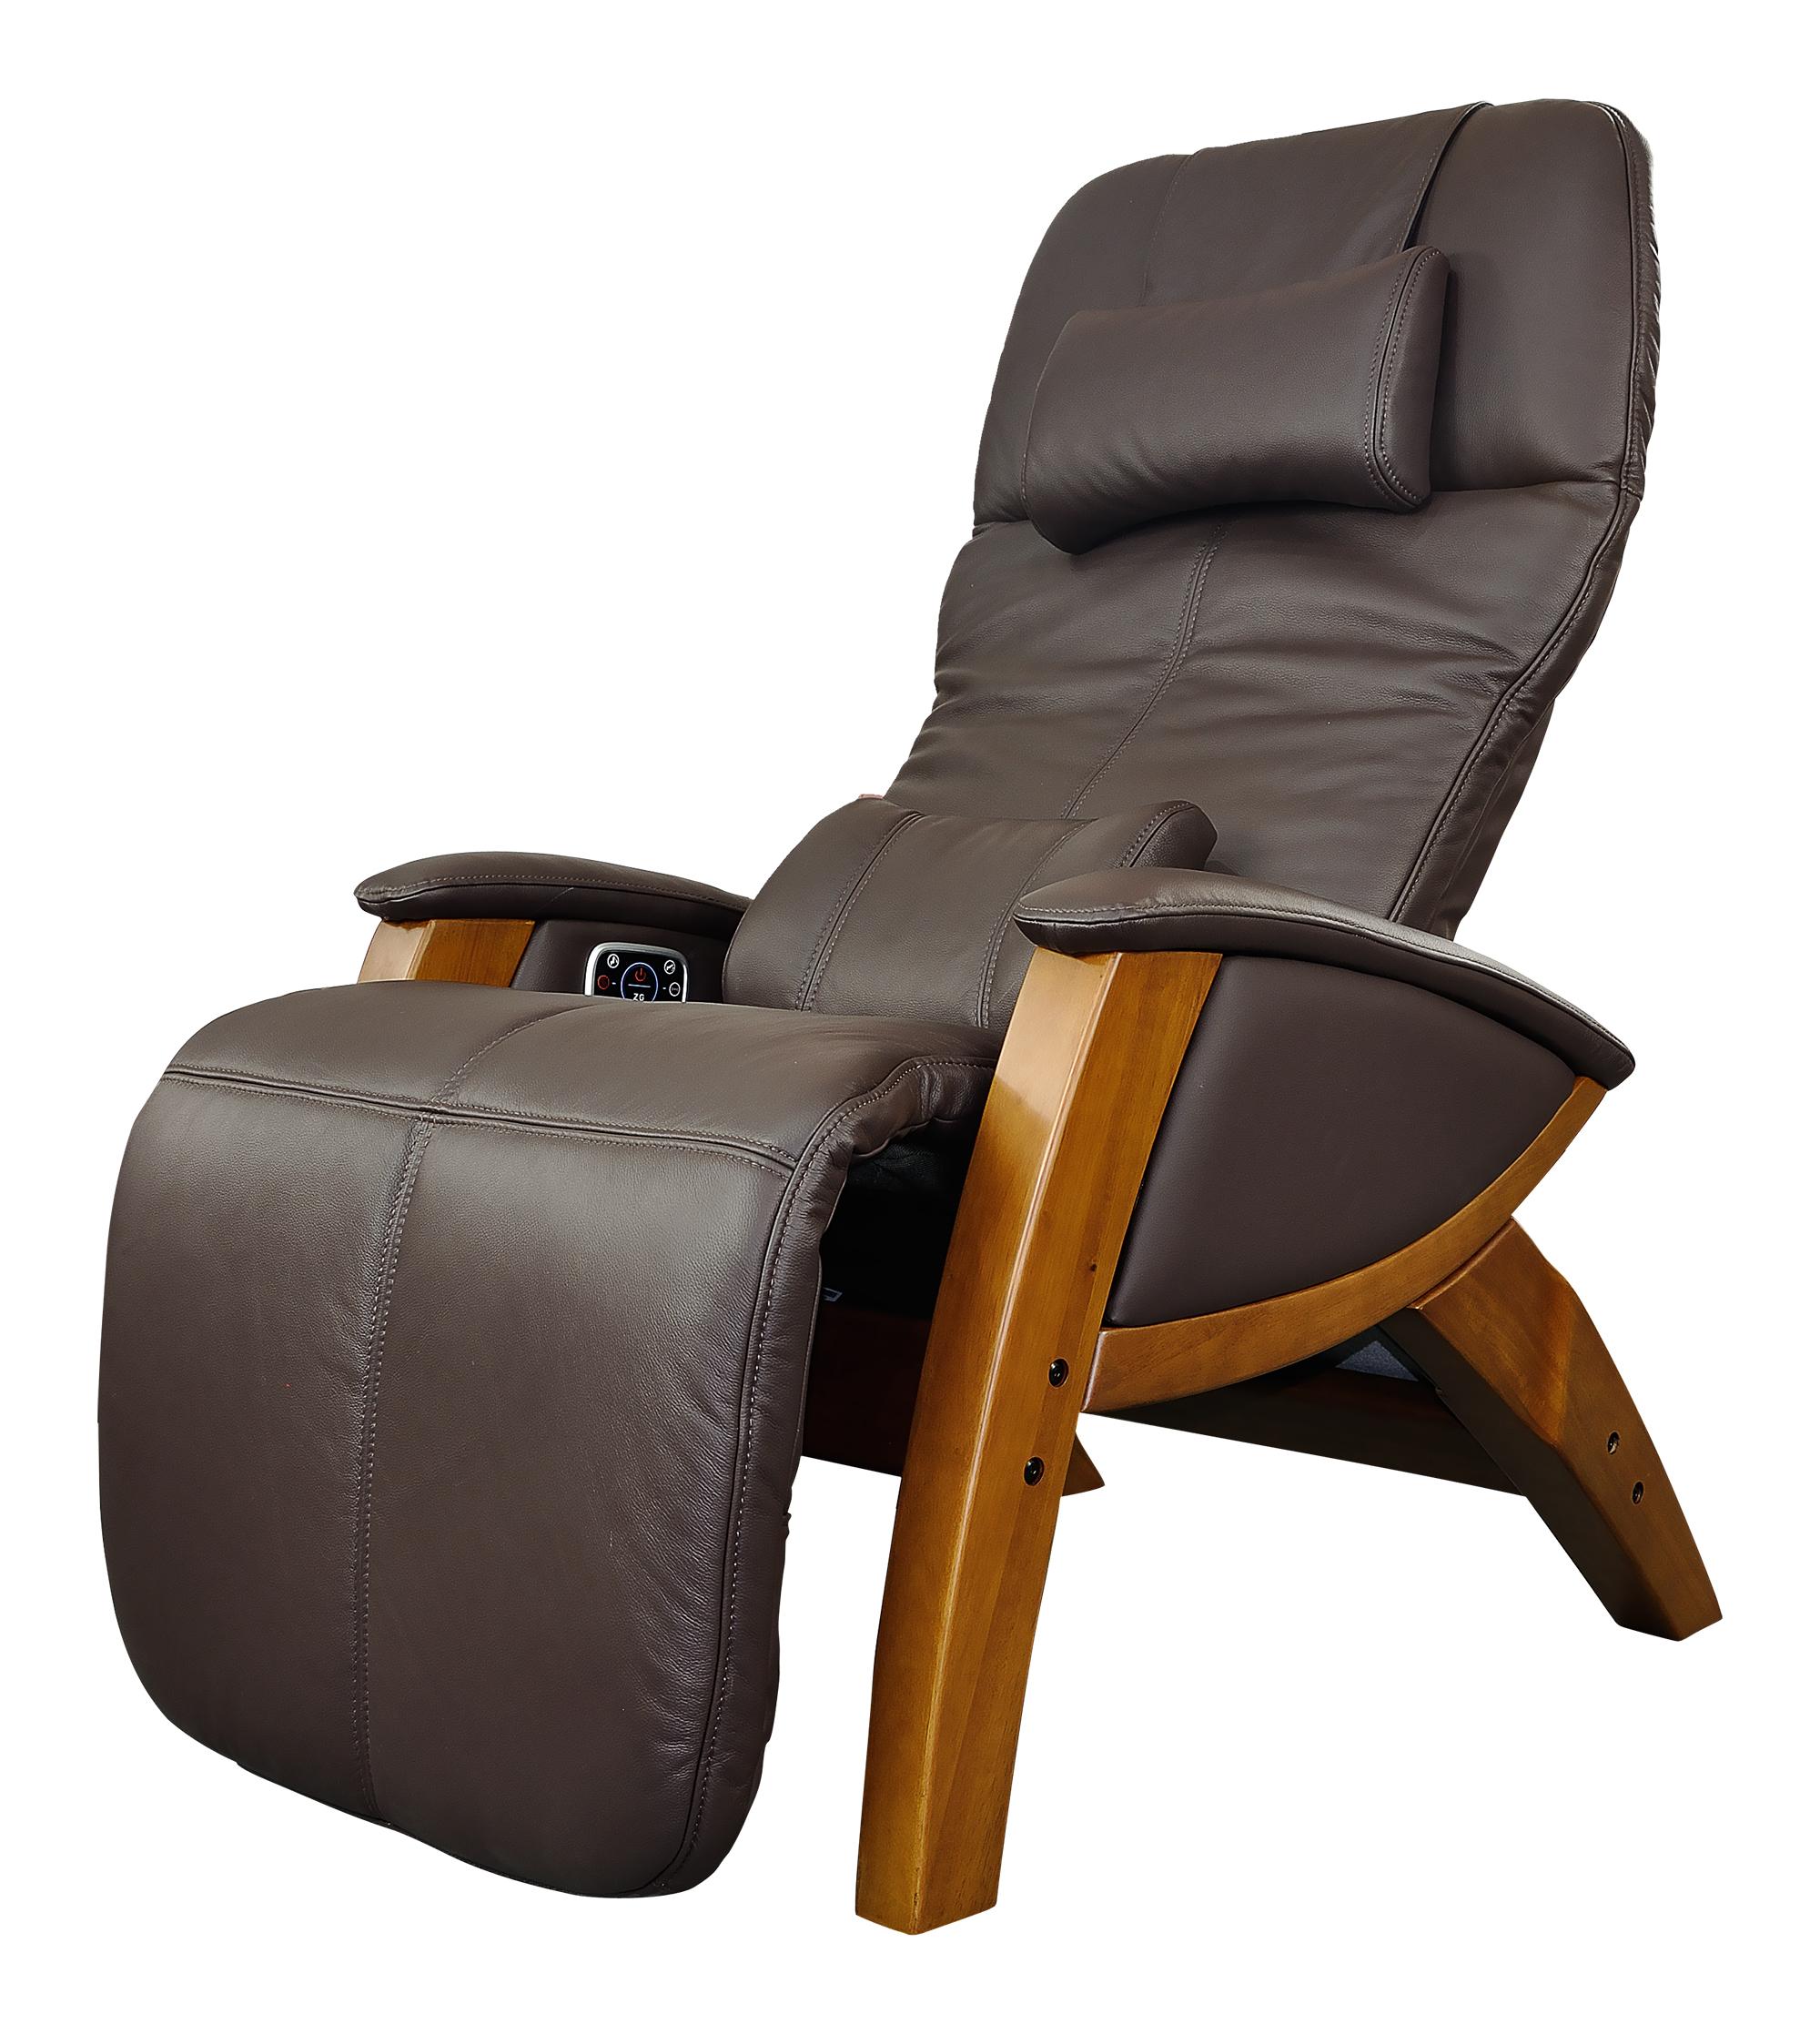 Svago Sv410 Benessere Chair Chocolate Leather Honey Wood Zero Gravity Recliner